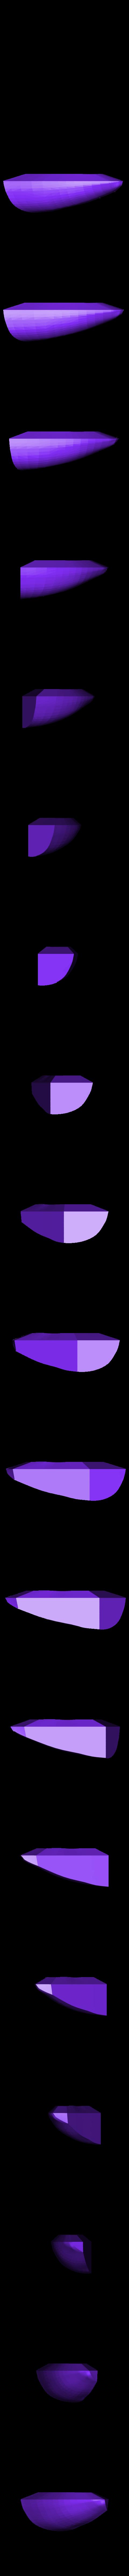 Lightcycle_Window_Right.STL Télécharger fichier STL gratuit Kit modèle Lightcycle • Objet pour impression 3D, billythemighty3Dprinter